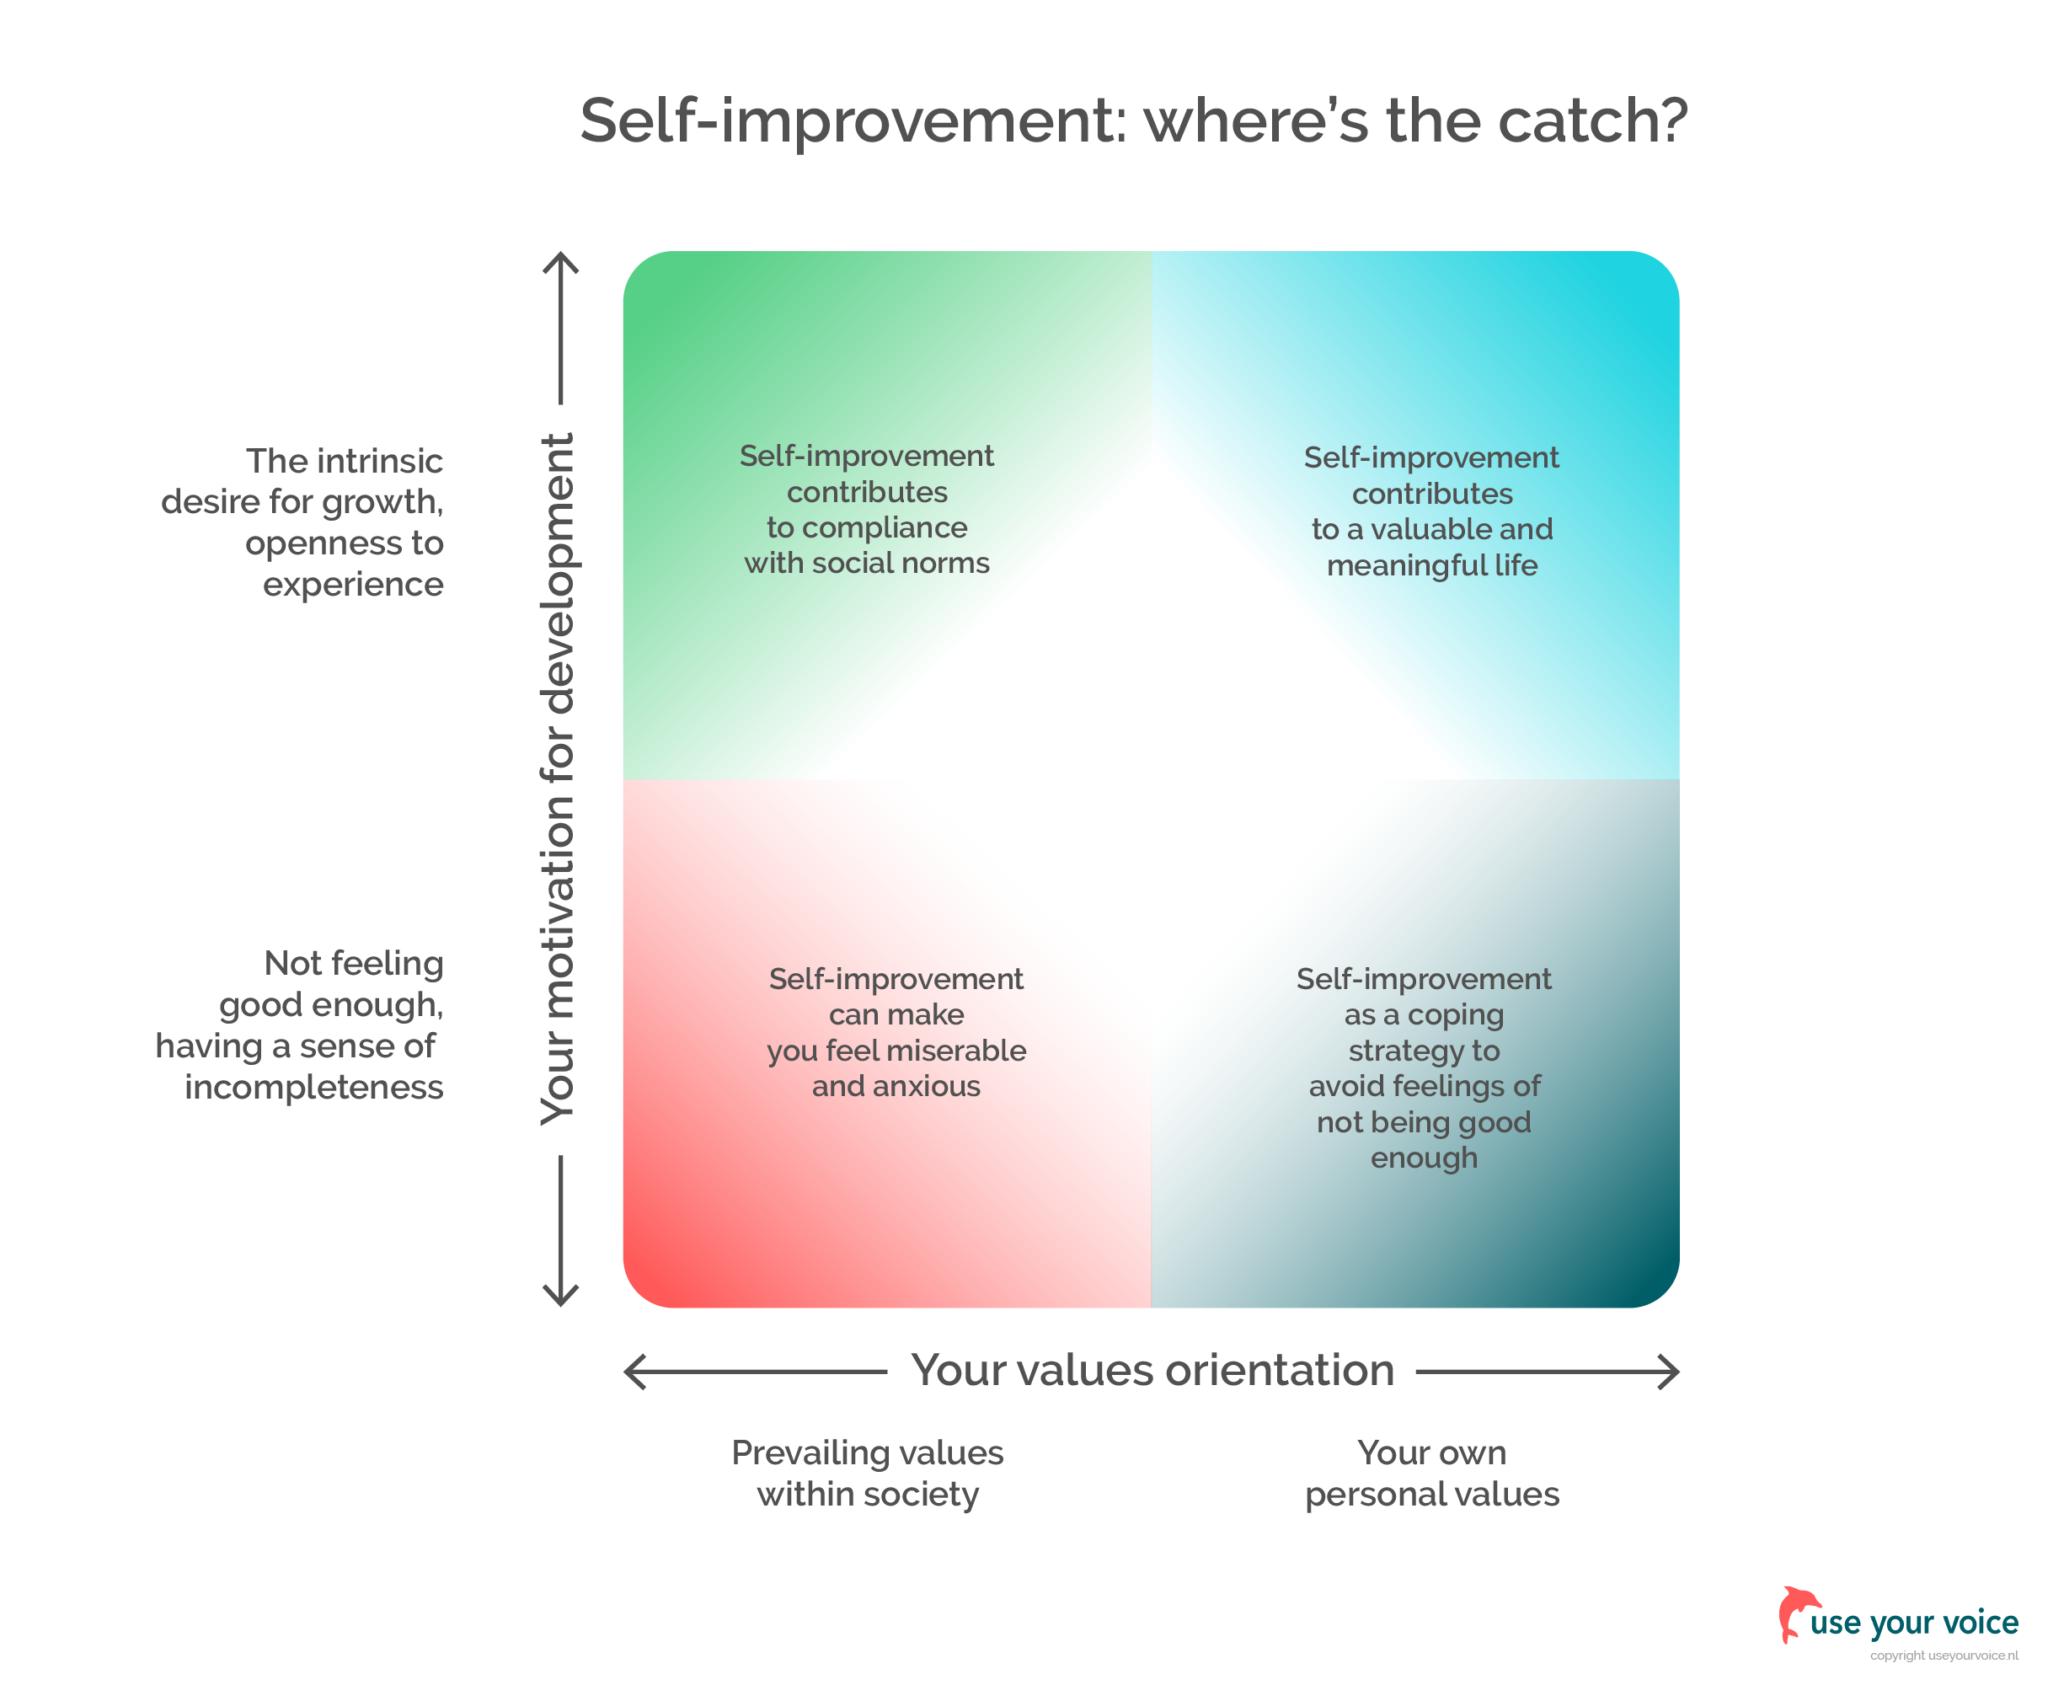 Self-improvement: where's the catch?